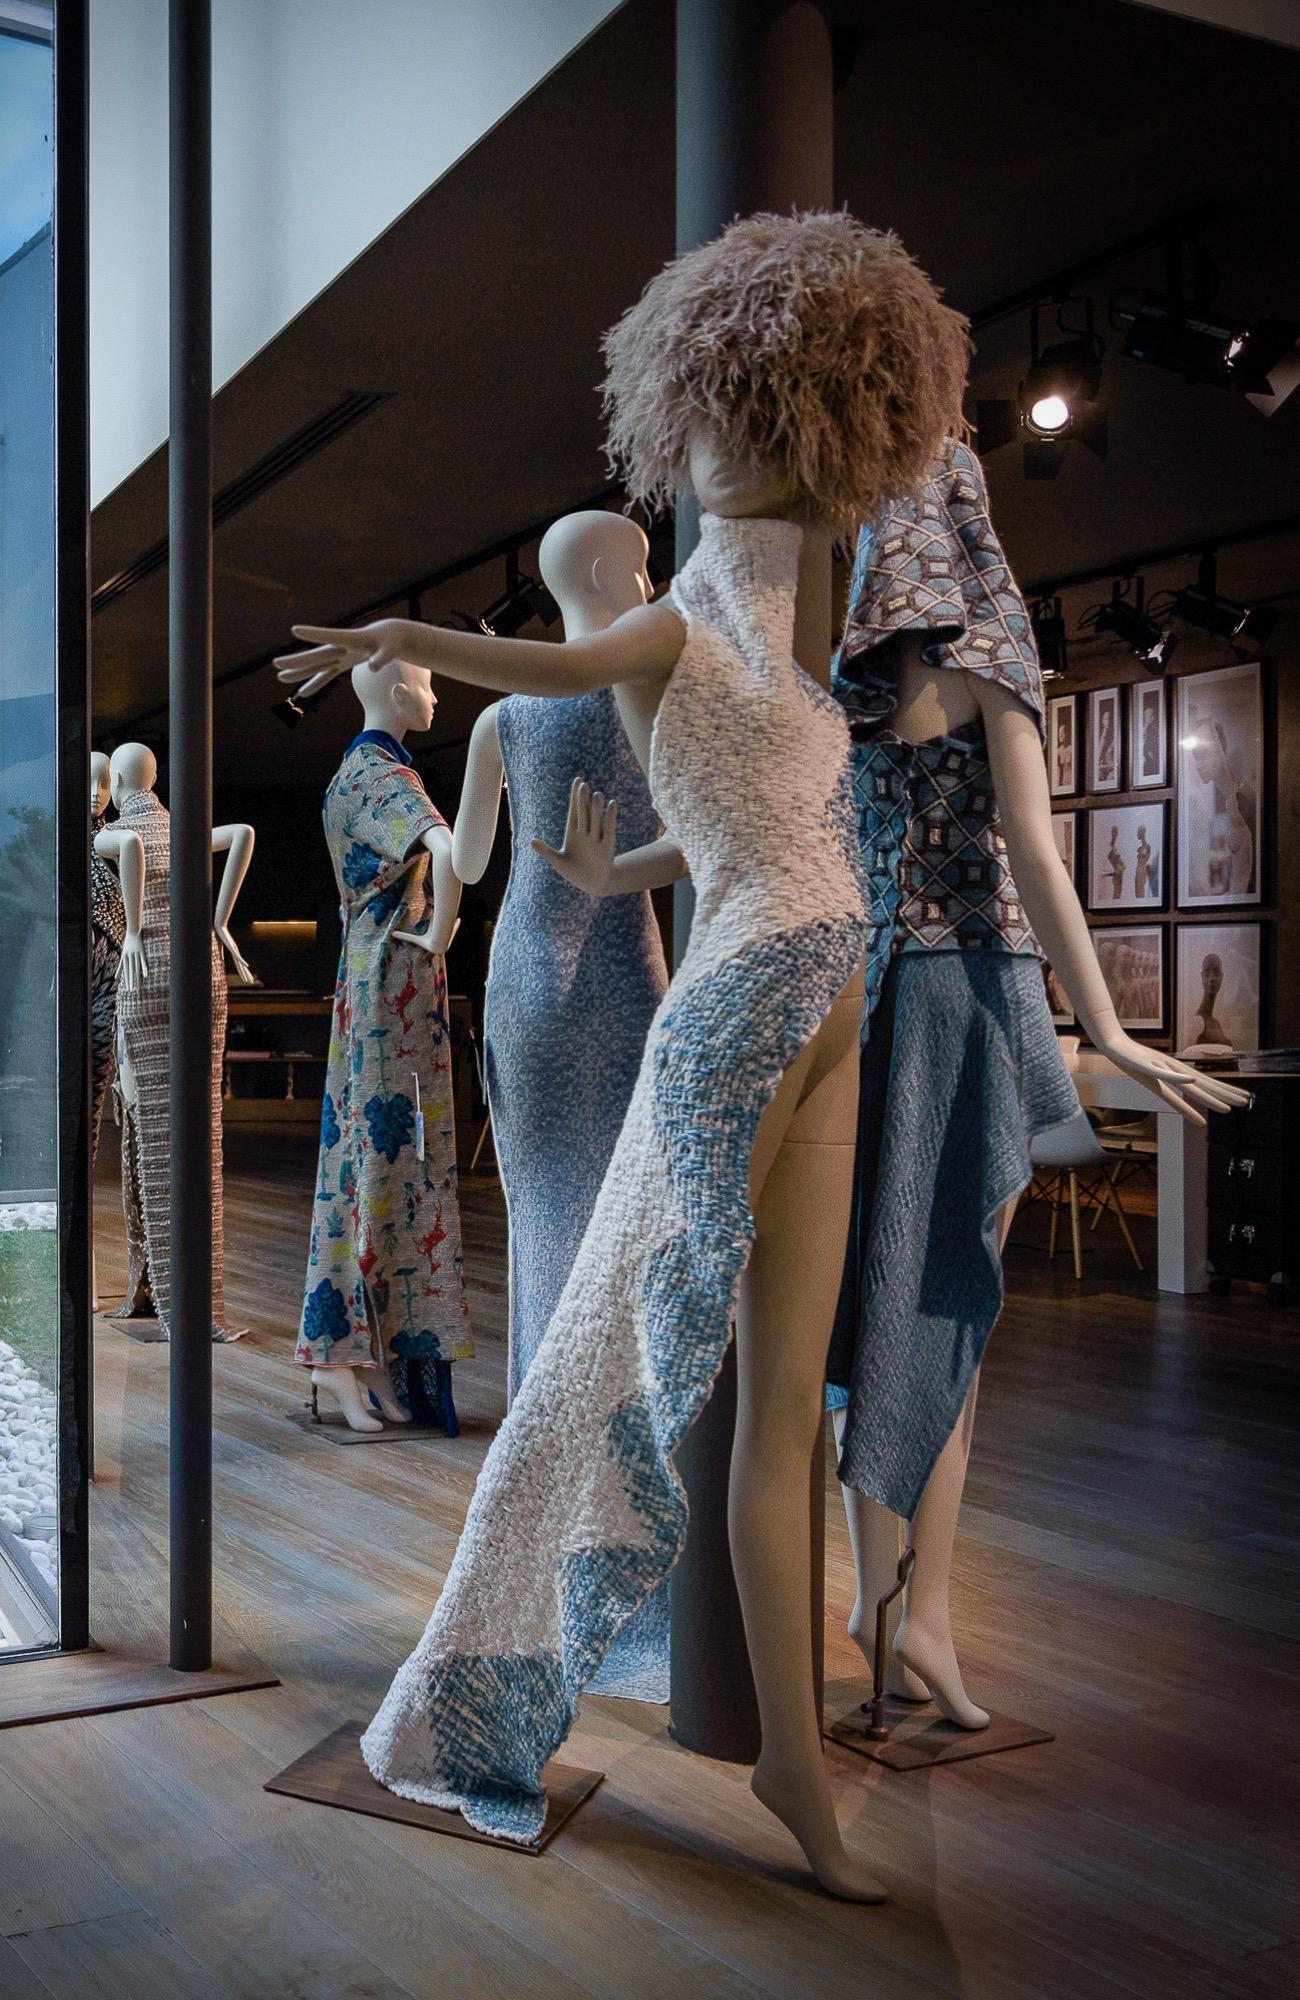 Schläppi 8000 Obsession female mannequin In Linea Piu yarns for exhibition at BonaveriMilano